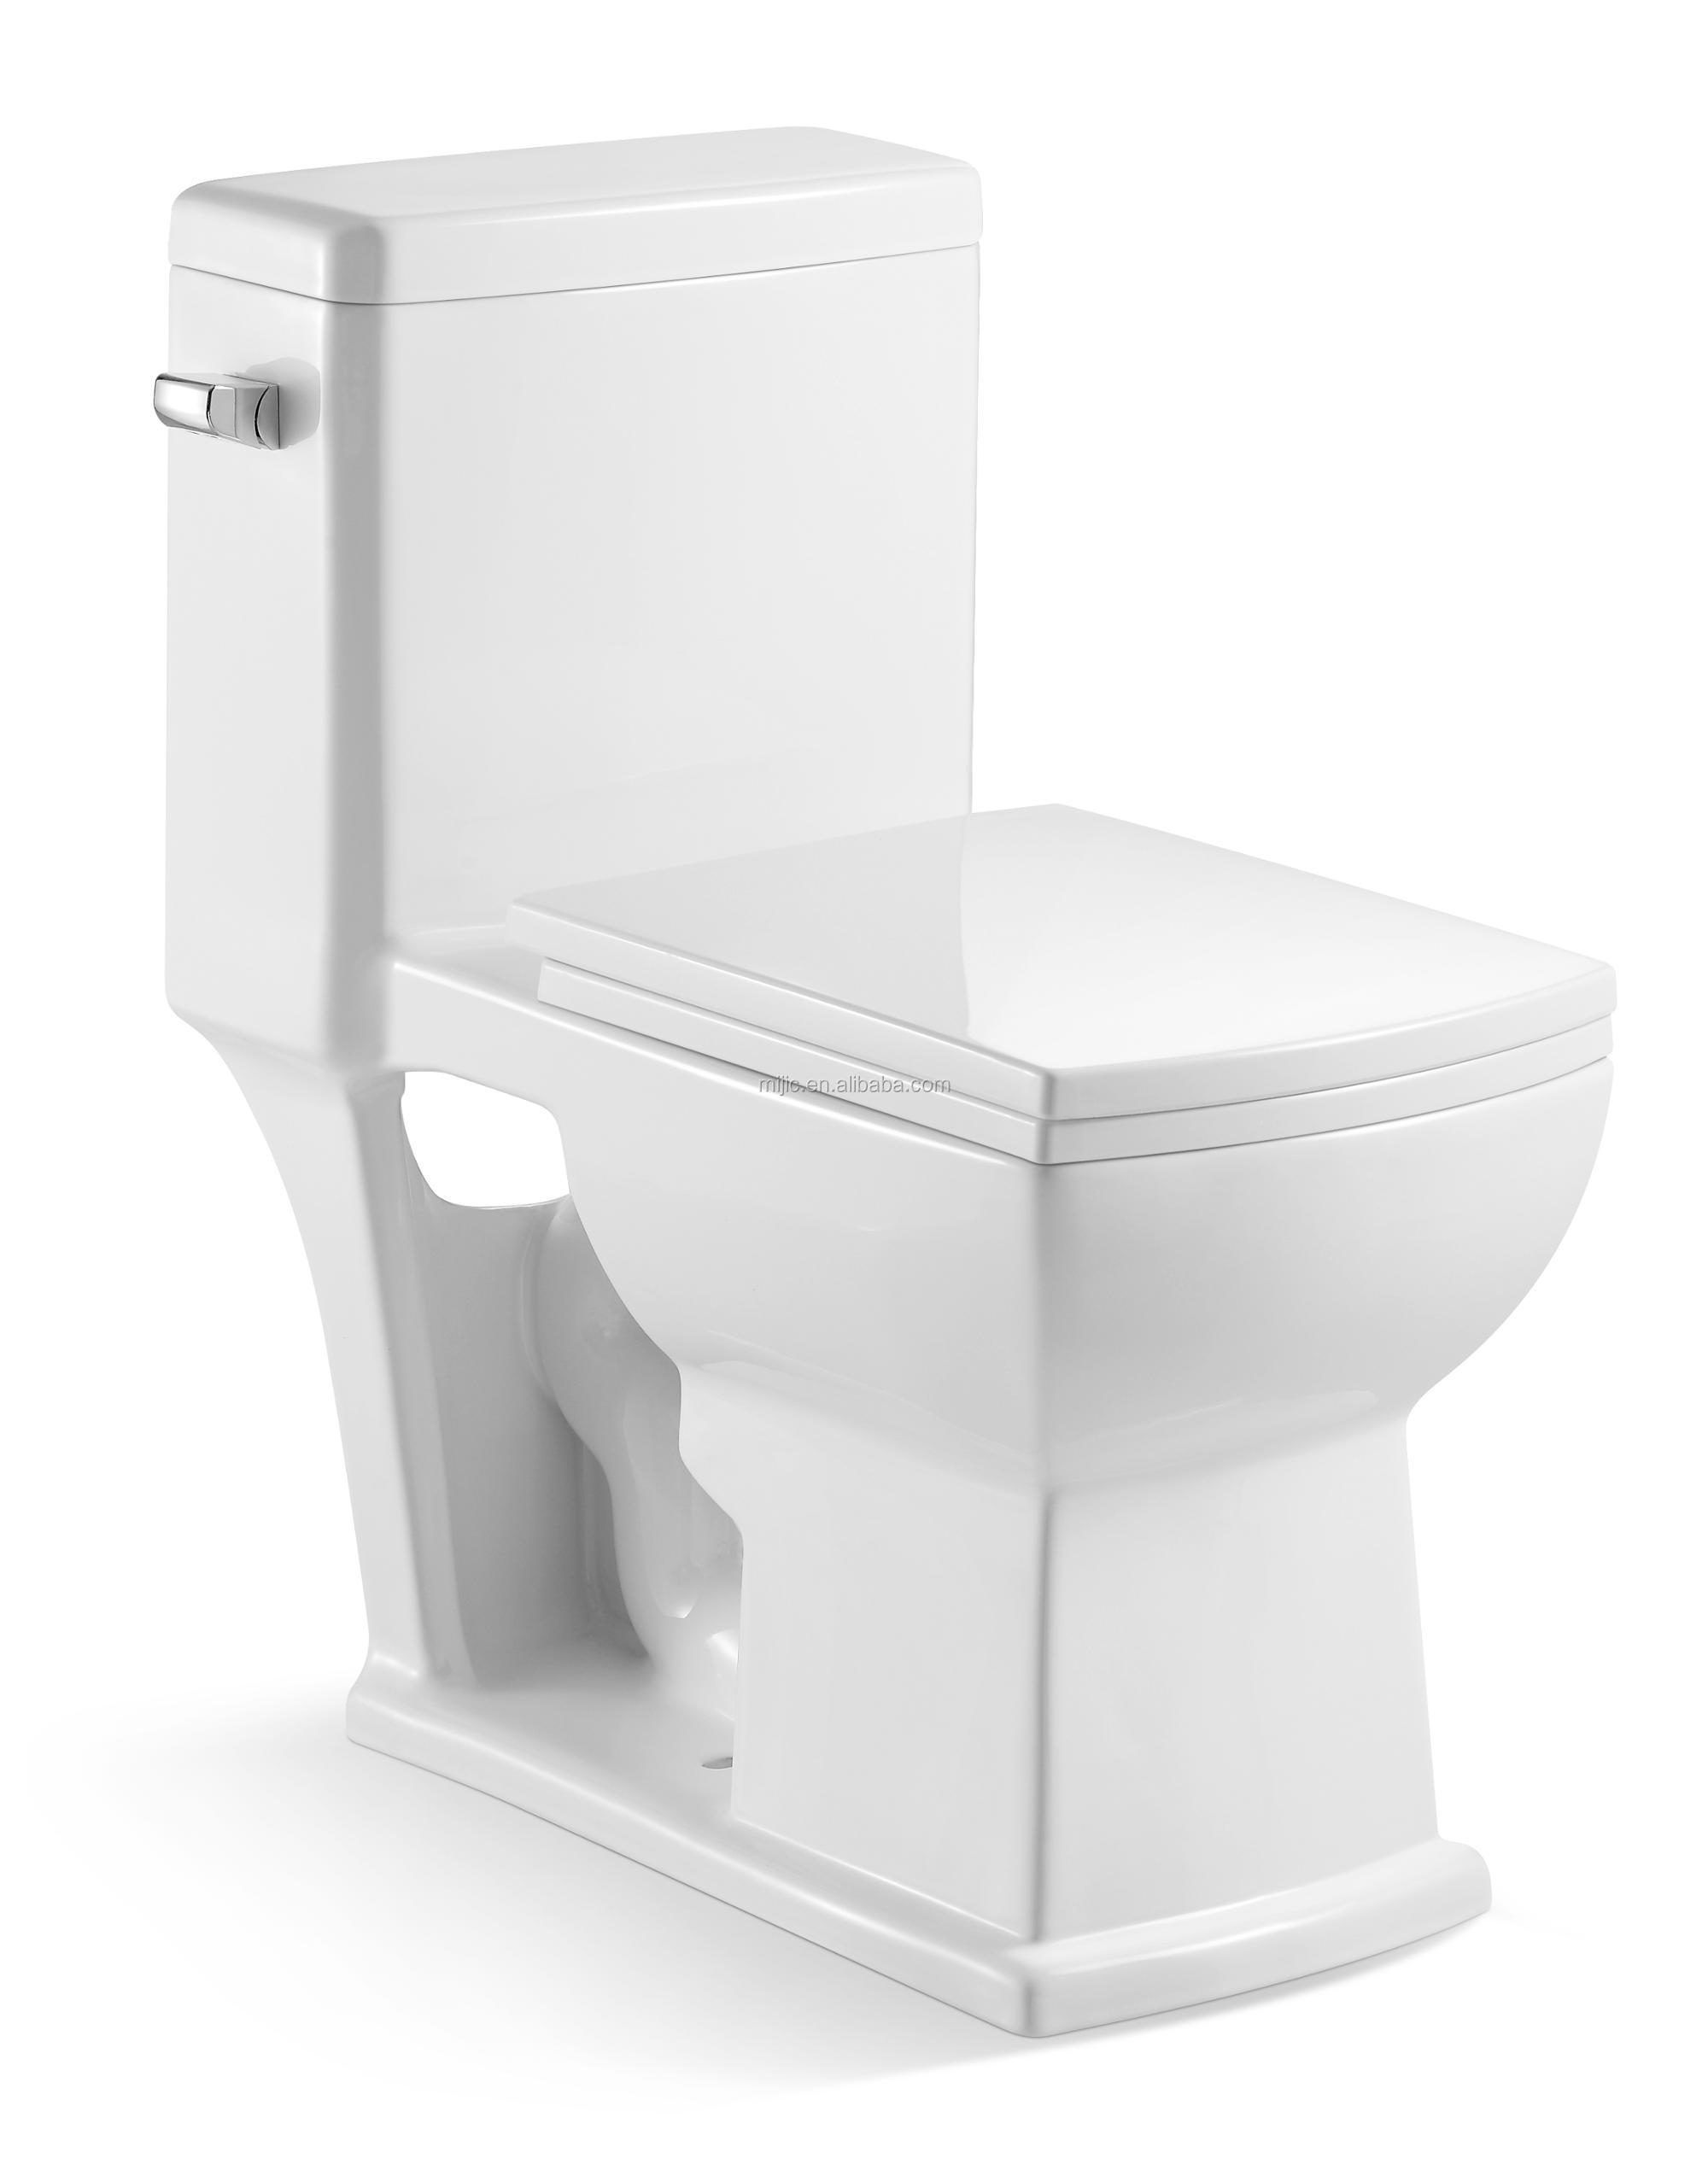 Incredible Mj T105 Ceramic Upc Toilet Seat Buy Upc Toilet Seat Product On Alibaba Com Lamtechconsult Wood Chair Design Ideas Lamtechconsultcom